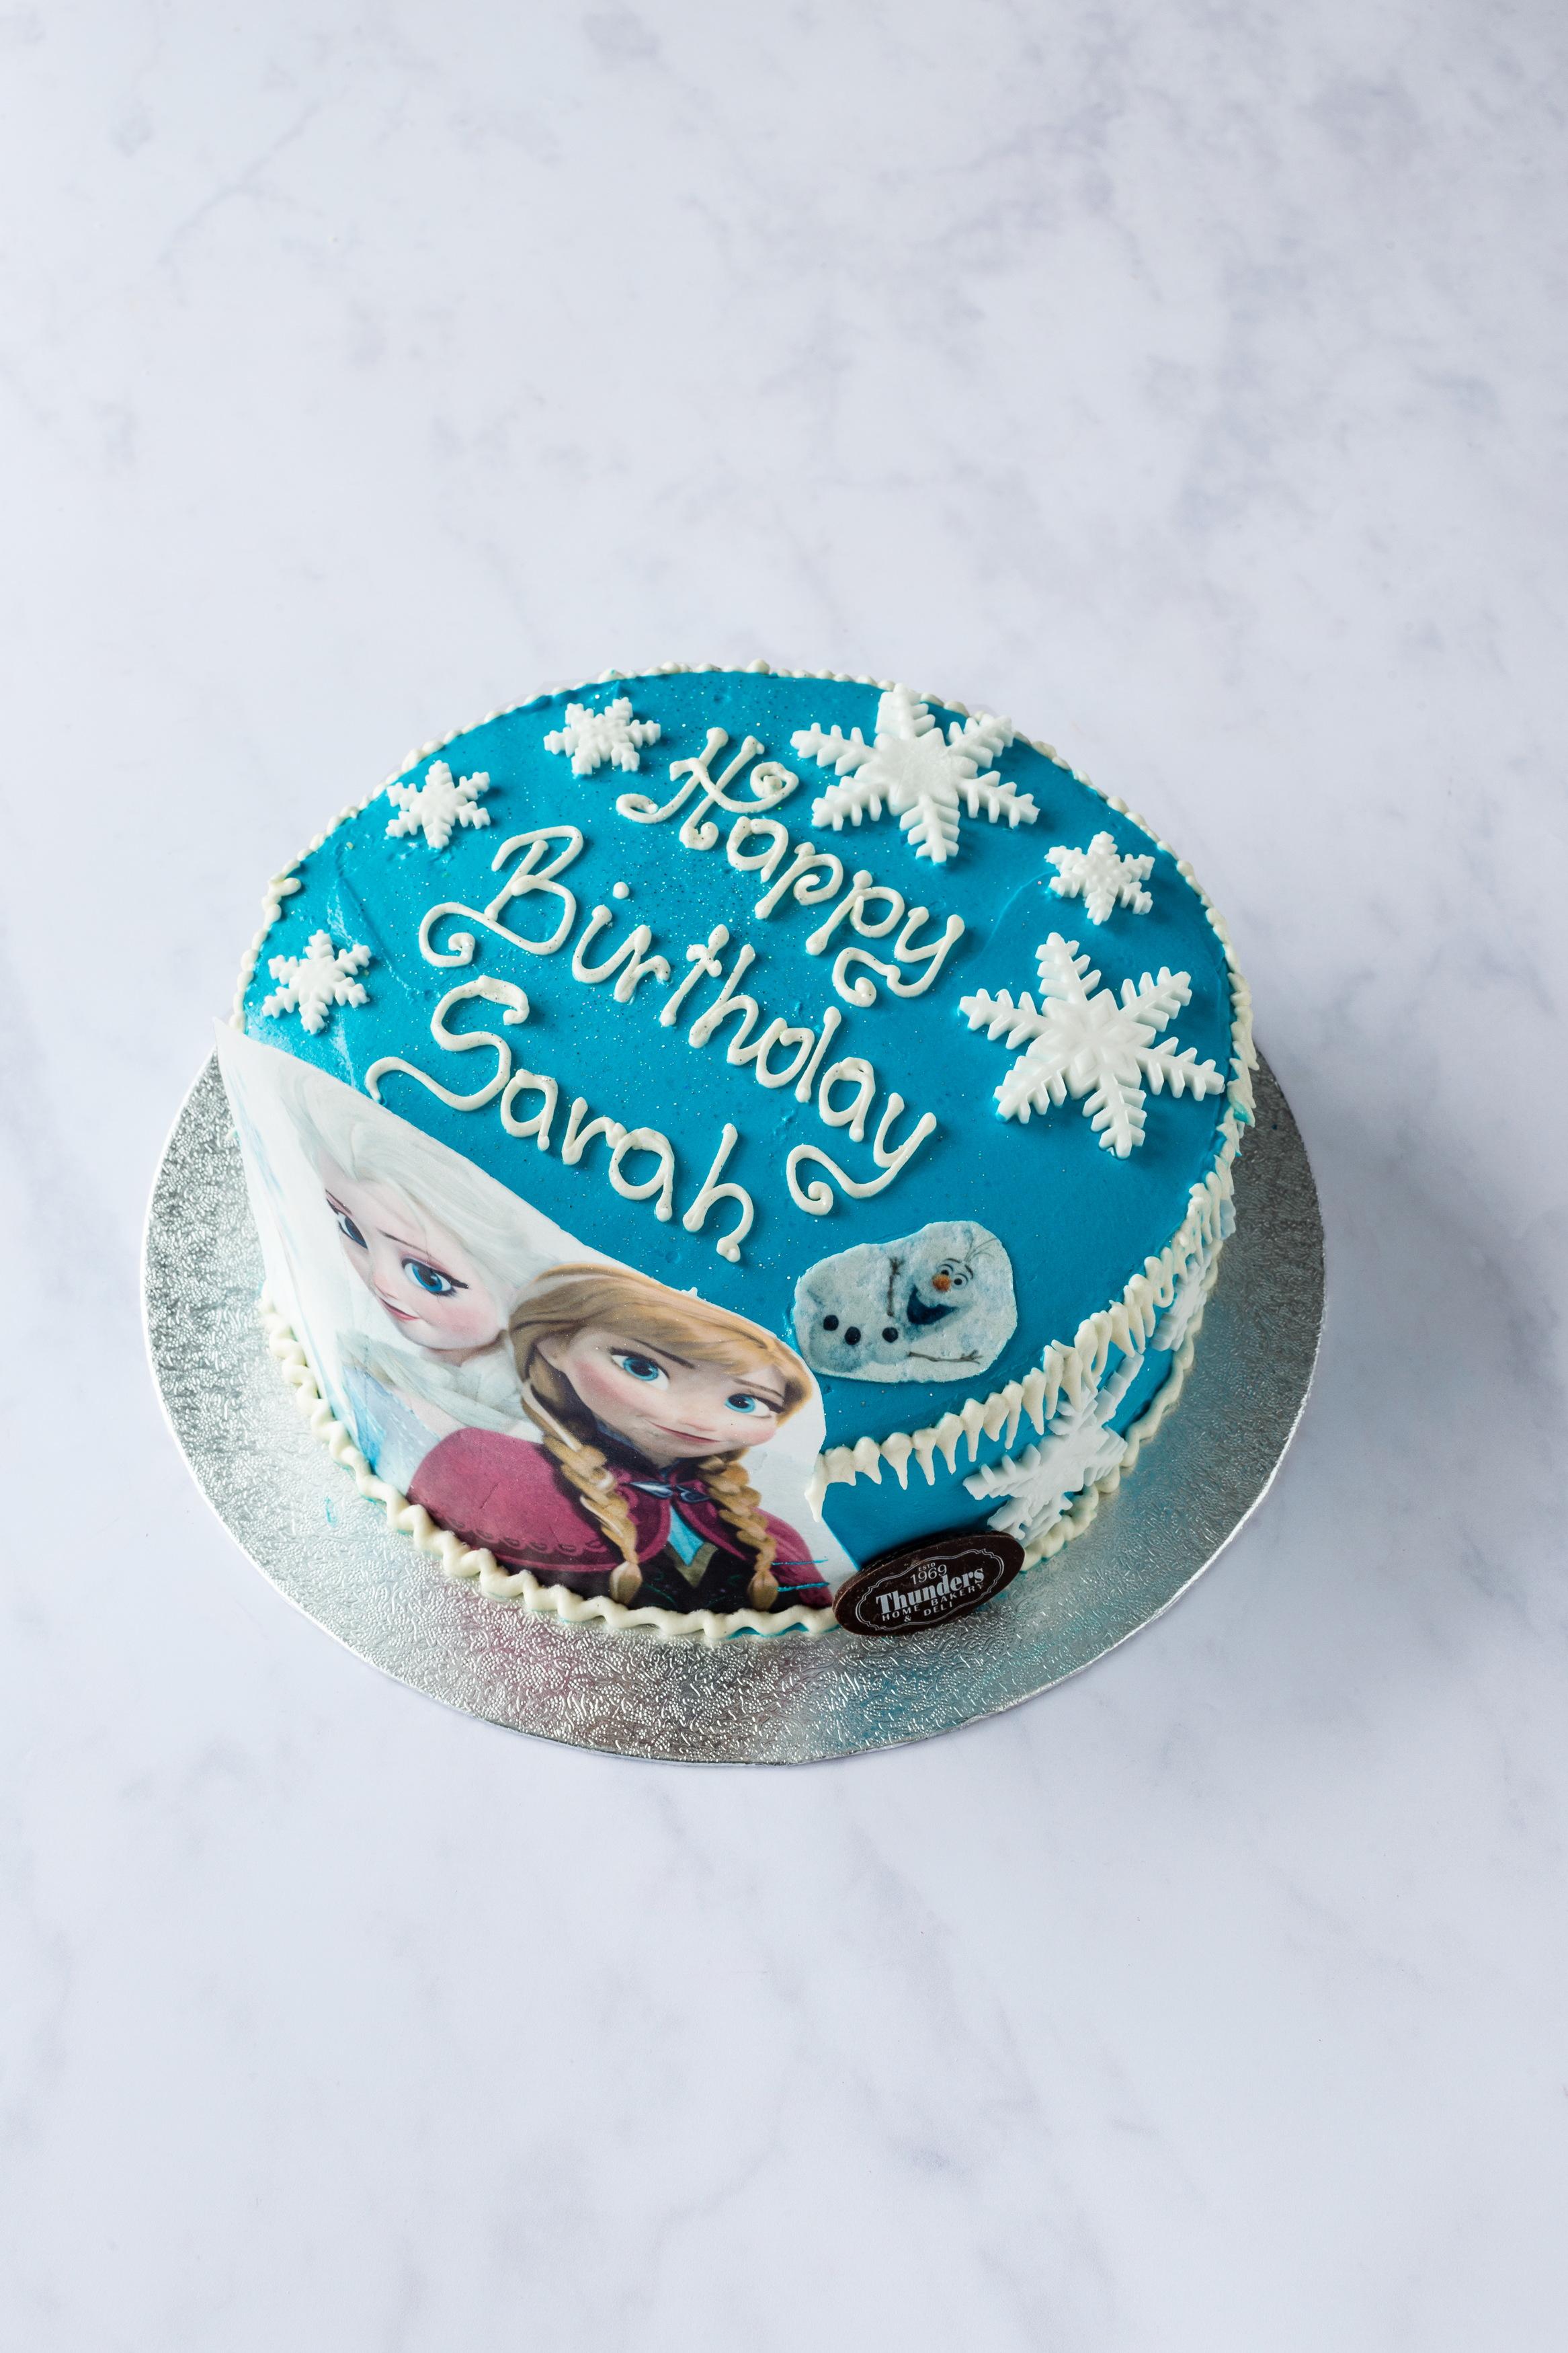 Thunders Novelty Ana Elsa Birthday Cake